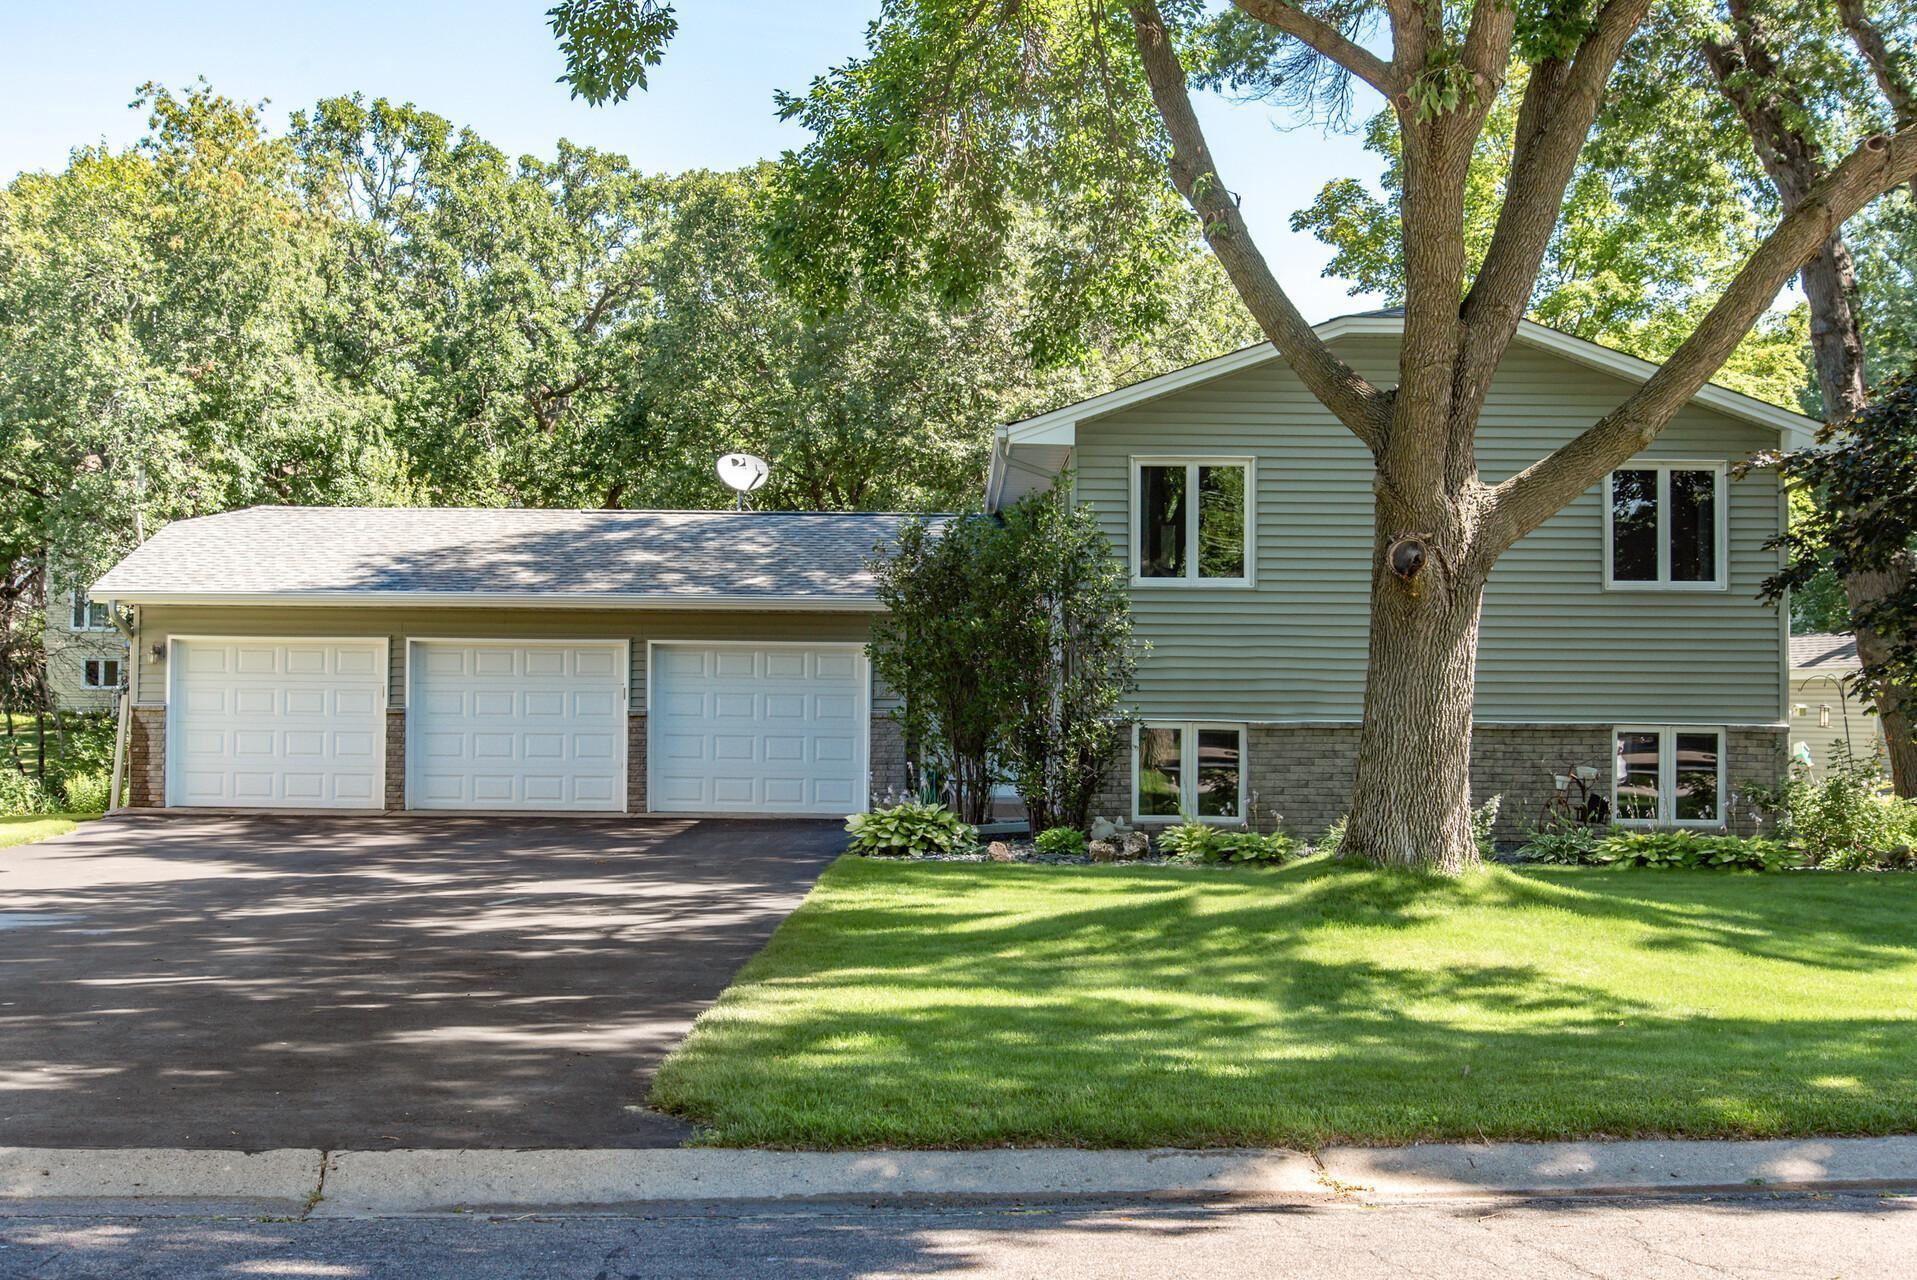 963 121st Lane NW, Coon Rapids, MN 55448 - MLS#: 5630180